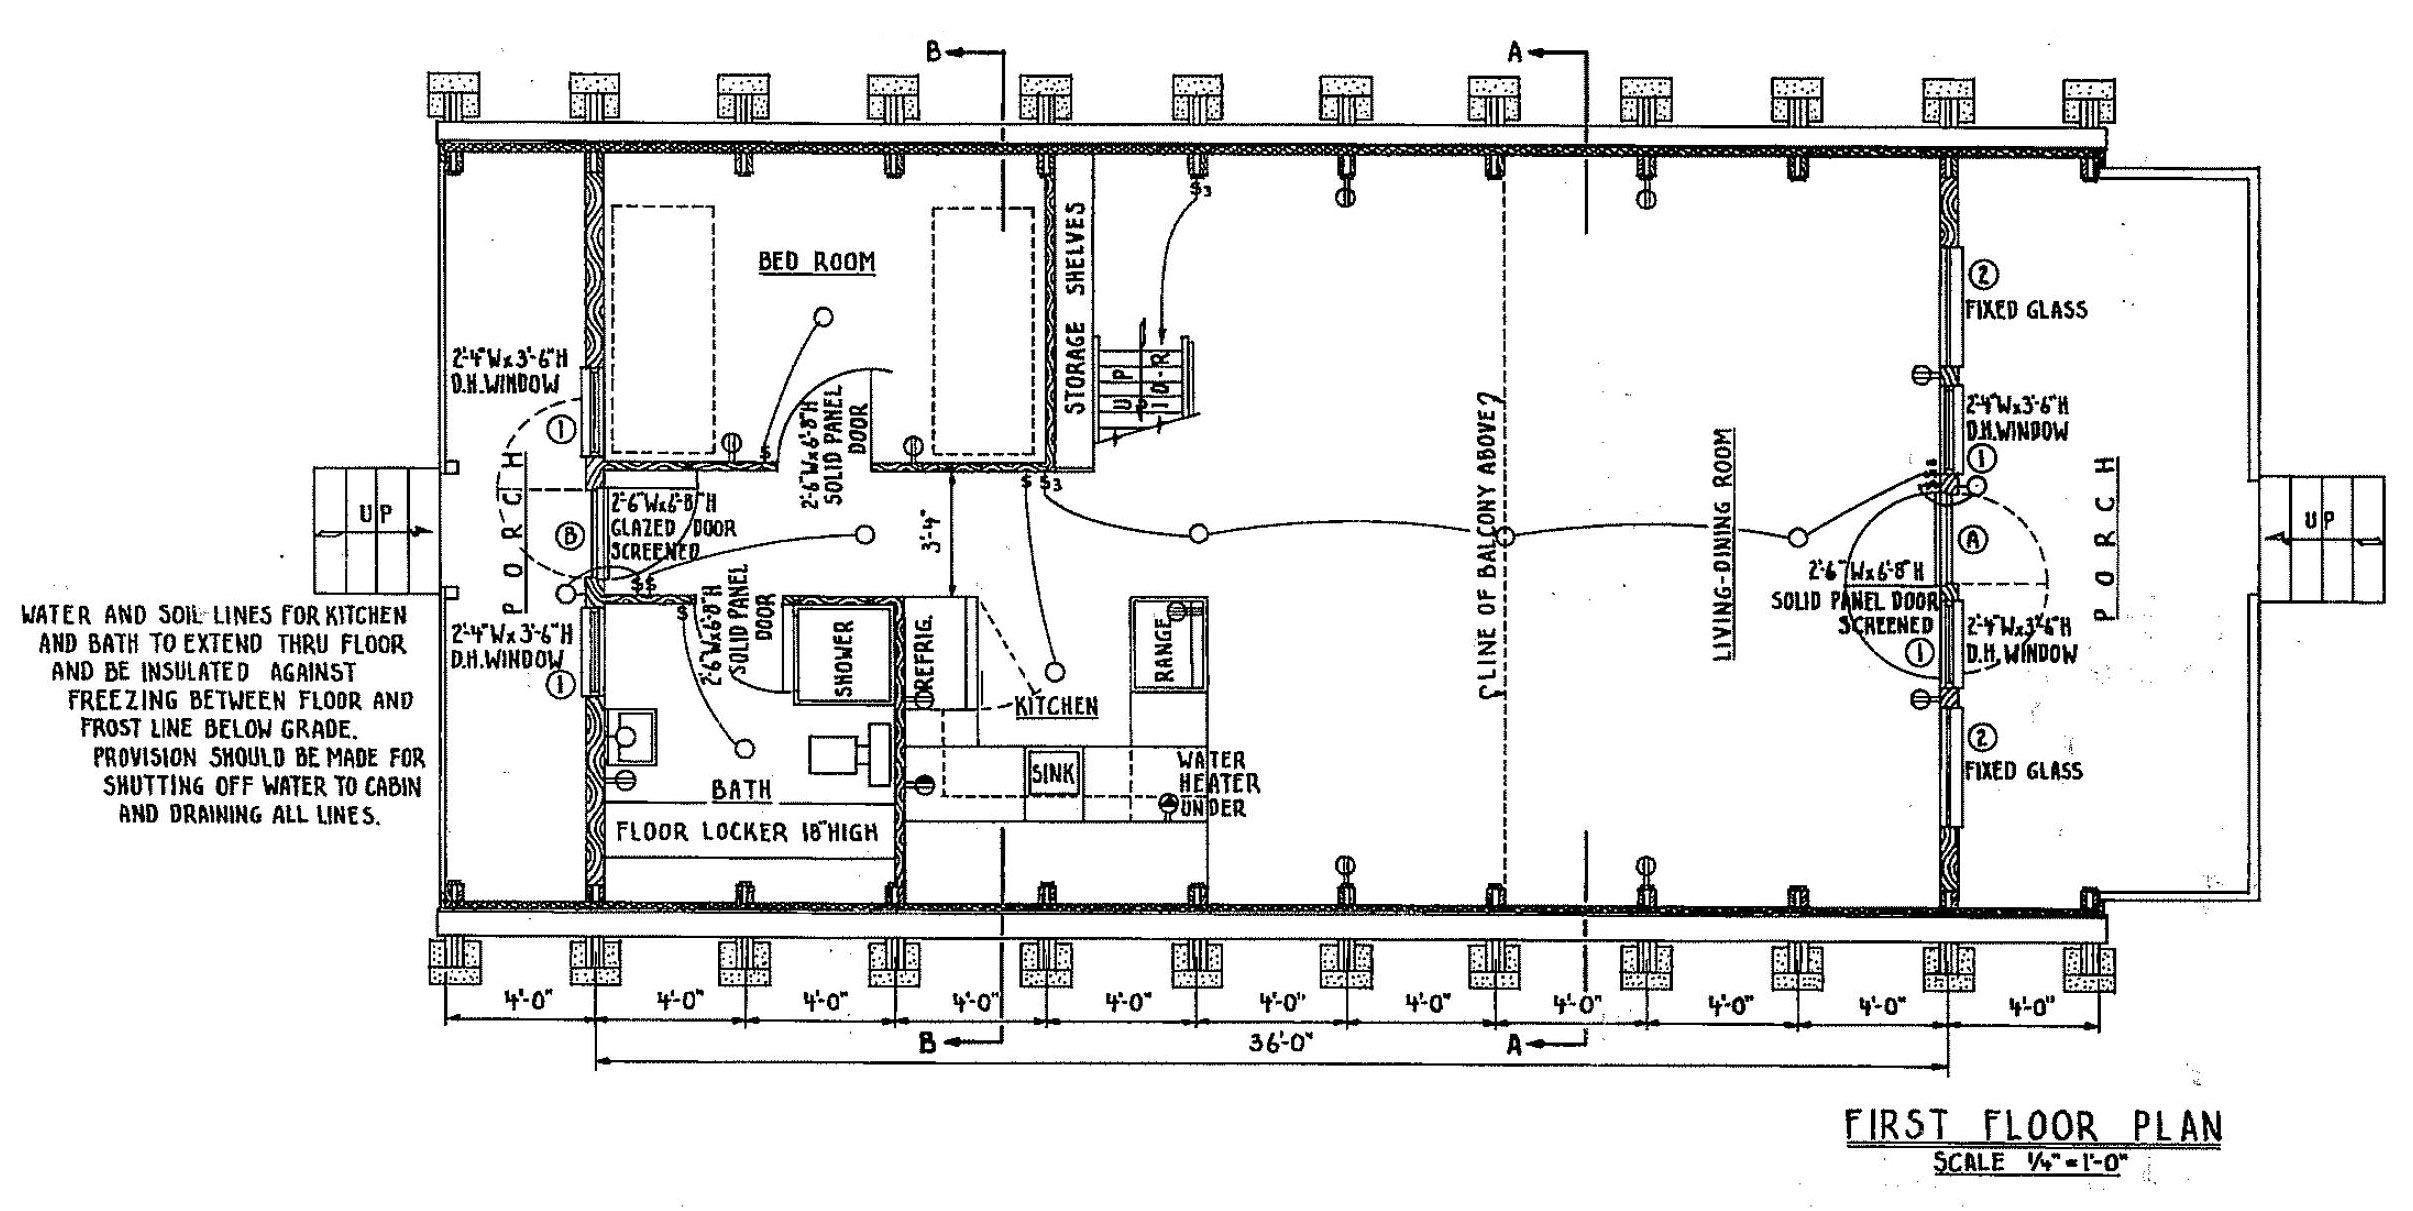 A Frame Home Floor Plan Design, 3 bedroom 1 bath, 36 by 20 feet ...